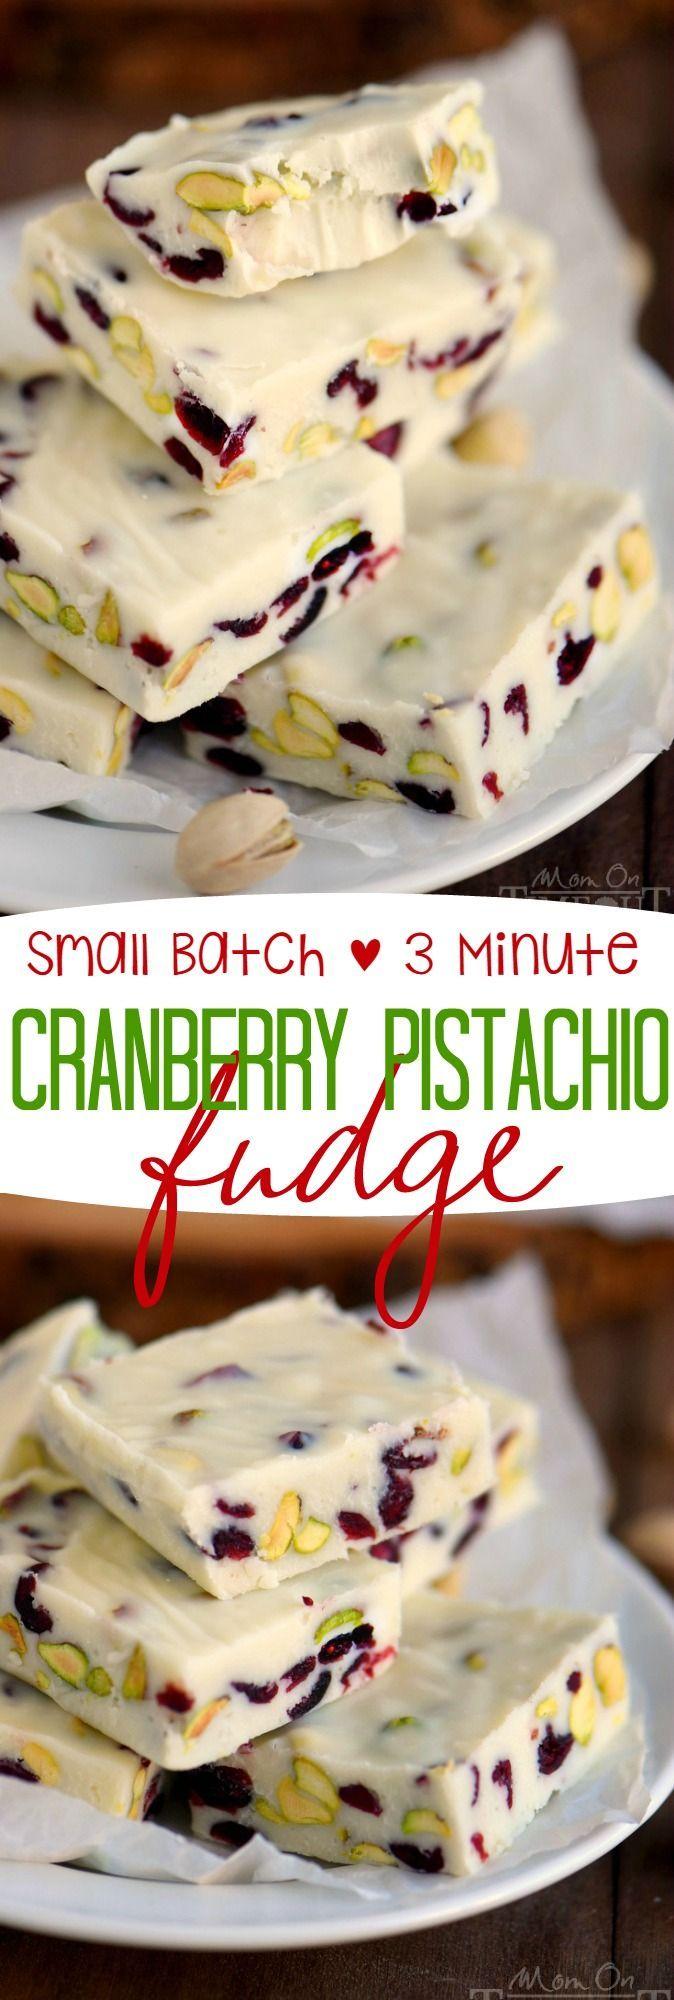 Small Batch 3 Minute Cranberry Pistachio Fudge